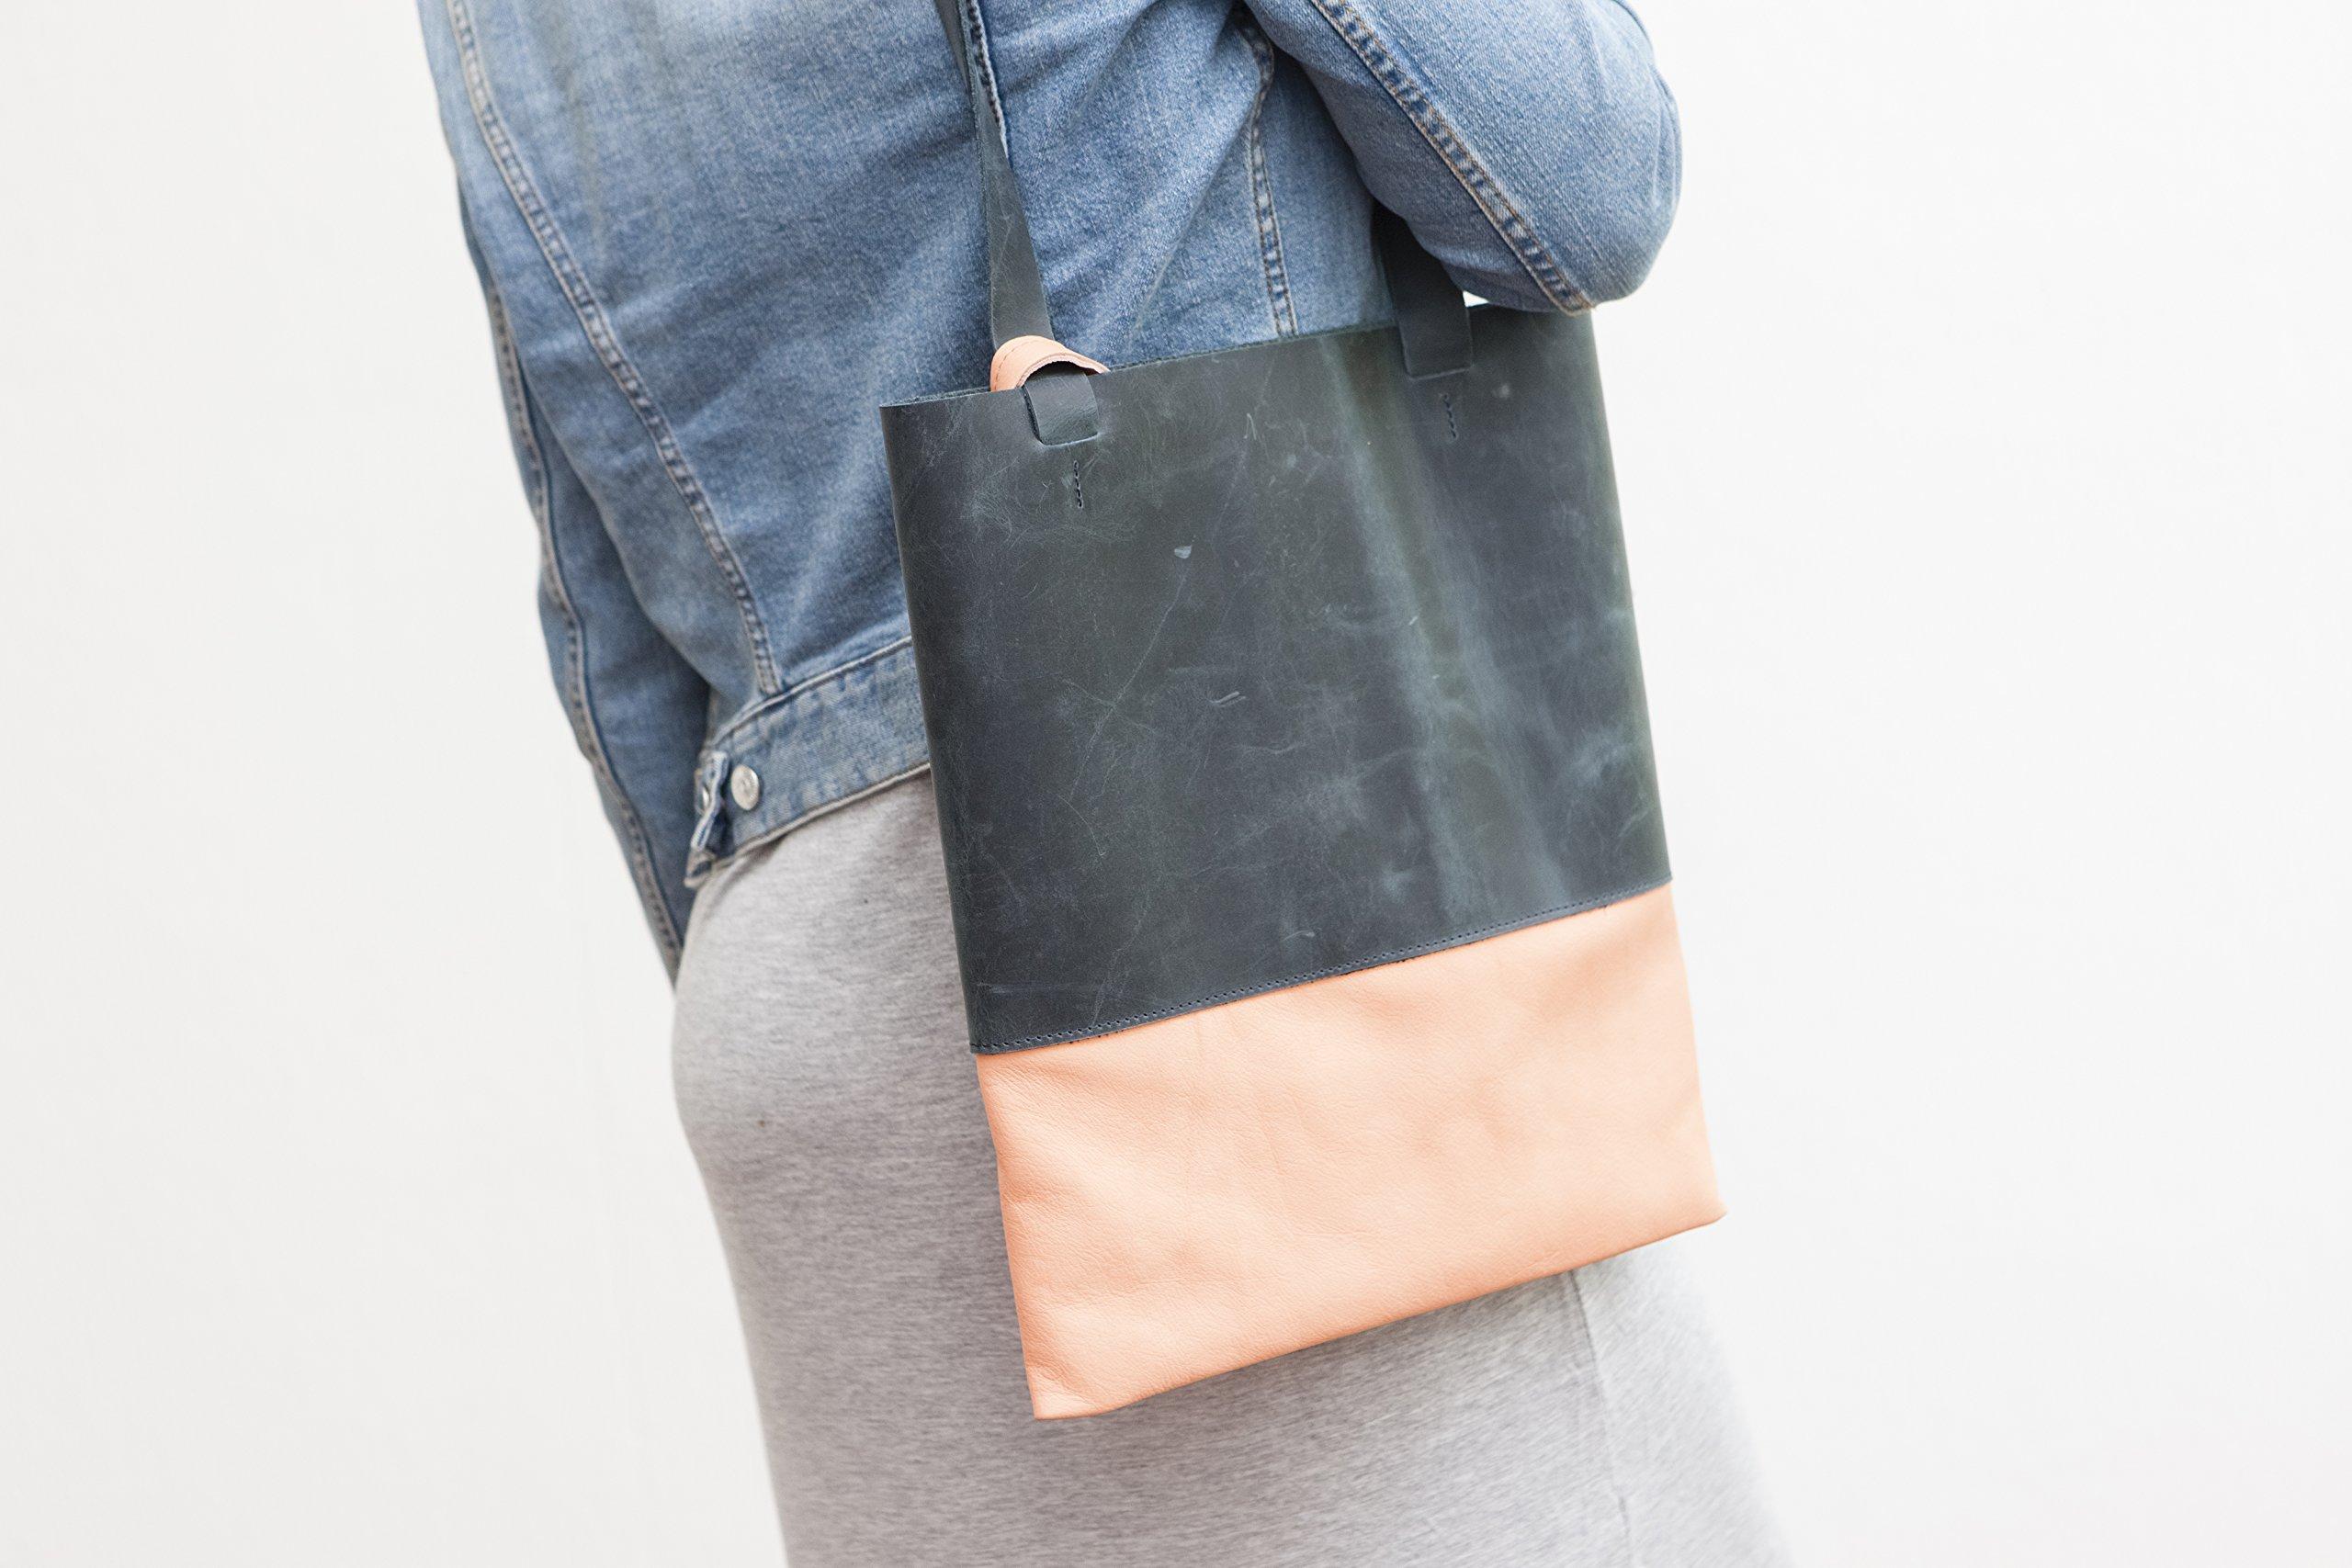 Black Tote Bag real leather Tote - handmade-bags